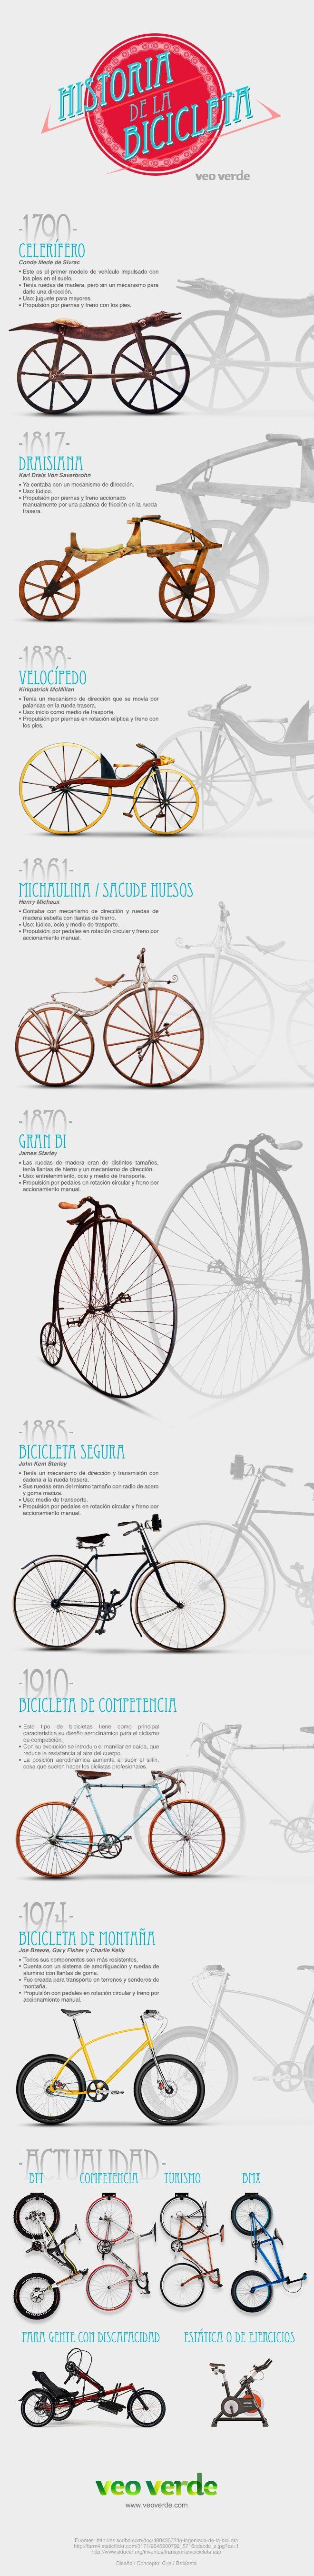 Infografia: Historia de la Bicicleta.